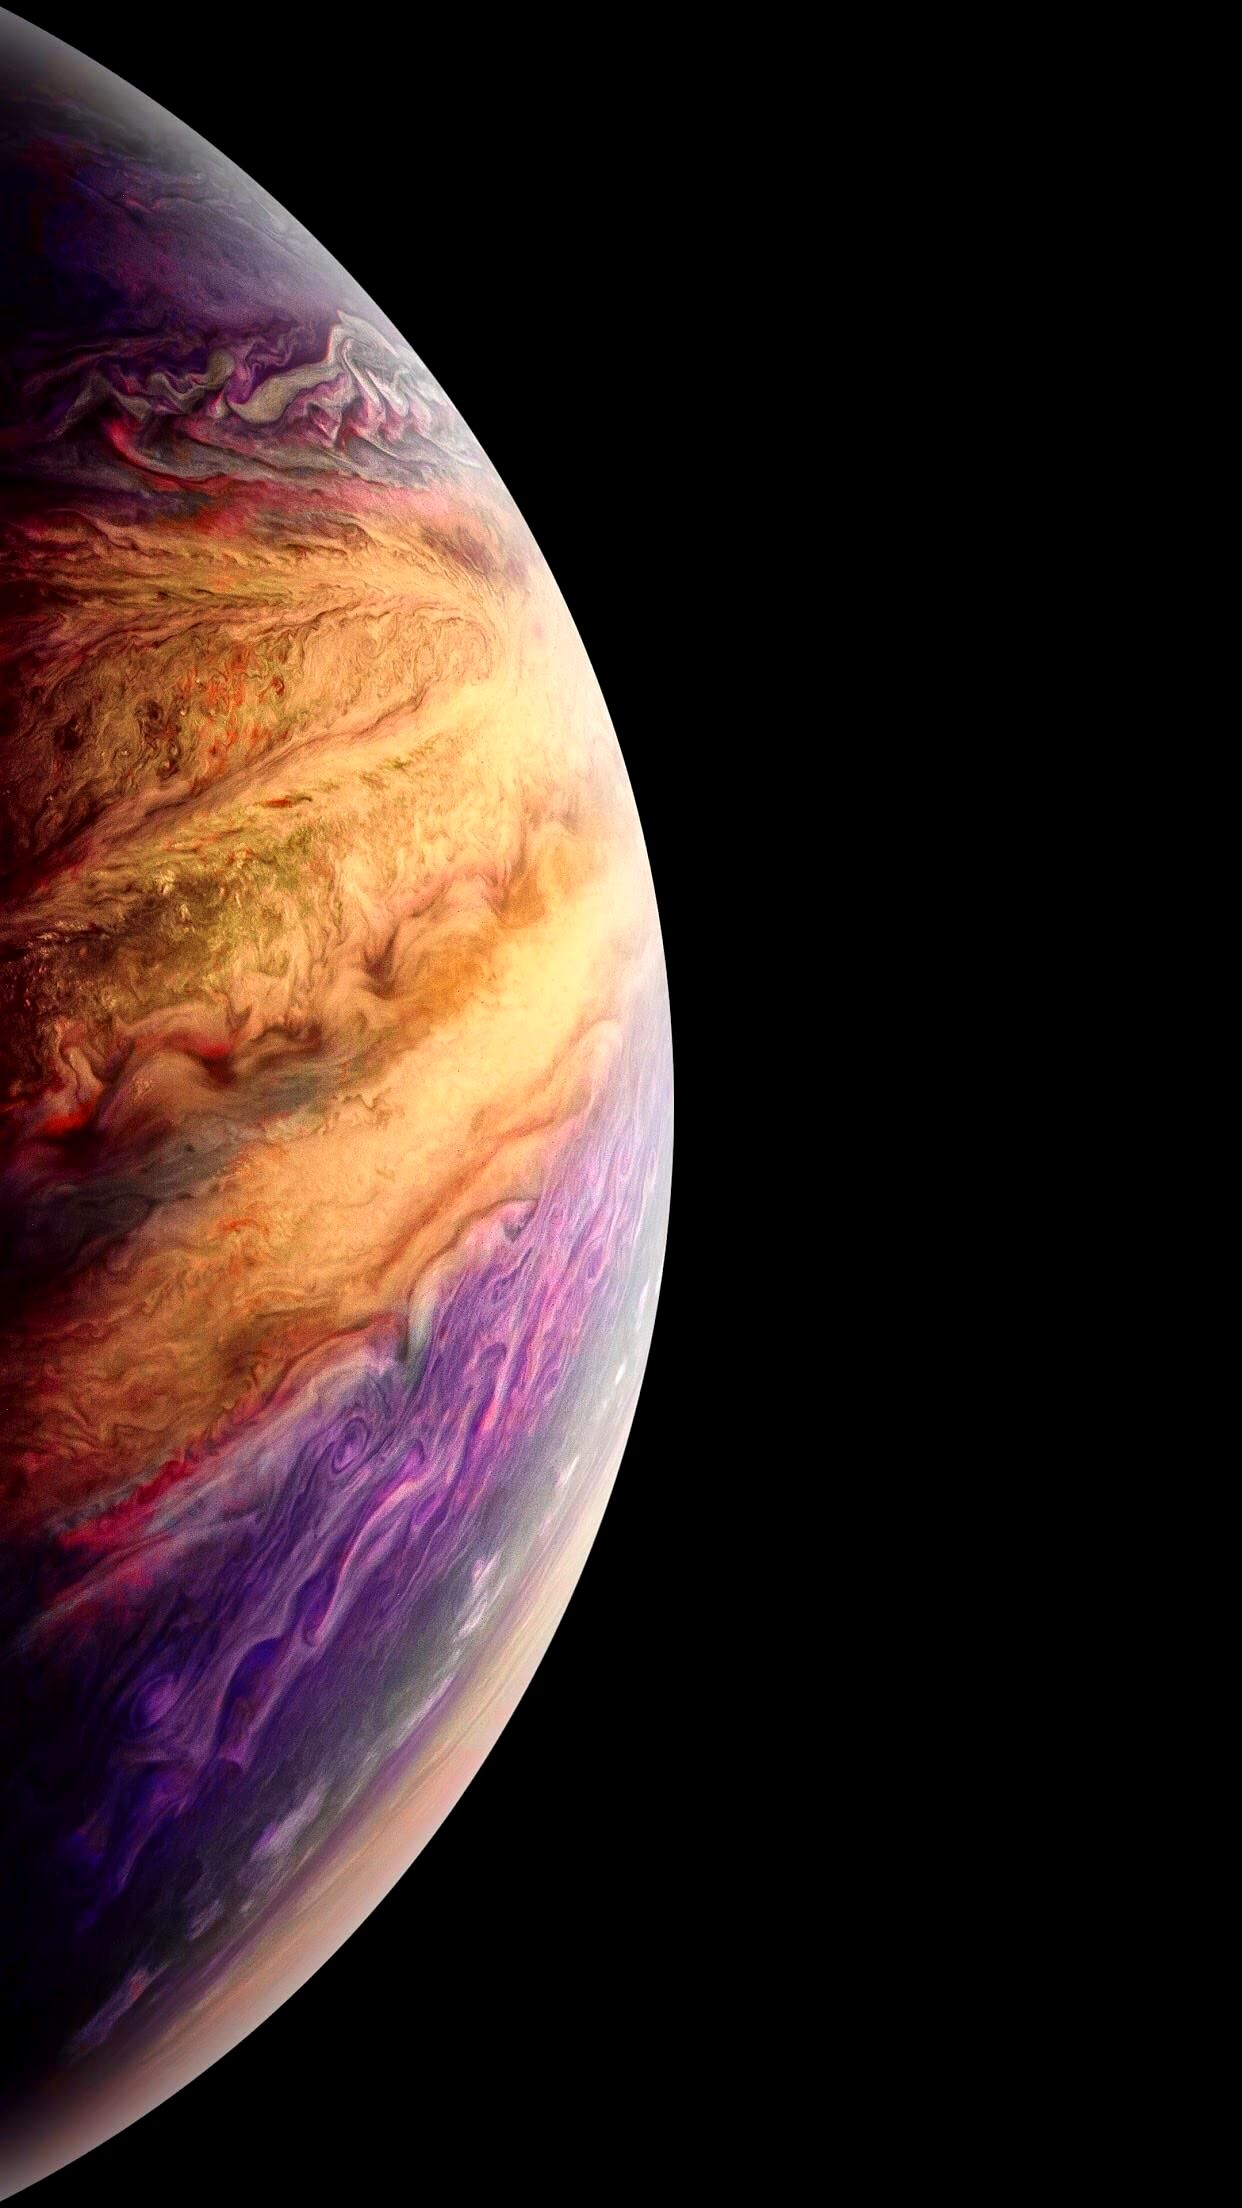 Jupiter Wallpaper 4K Iphone Trick วอลเปเปอร์, วอลเปเปอร์